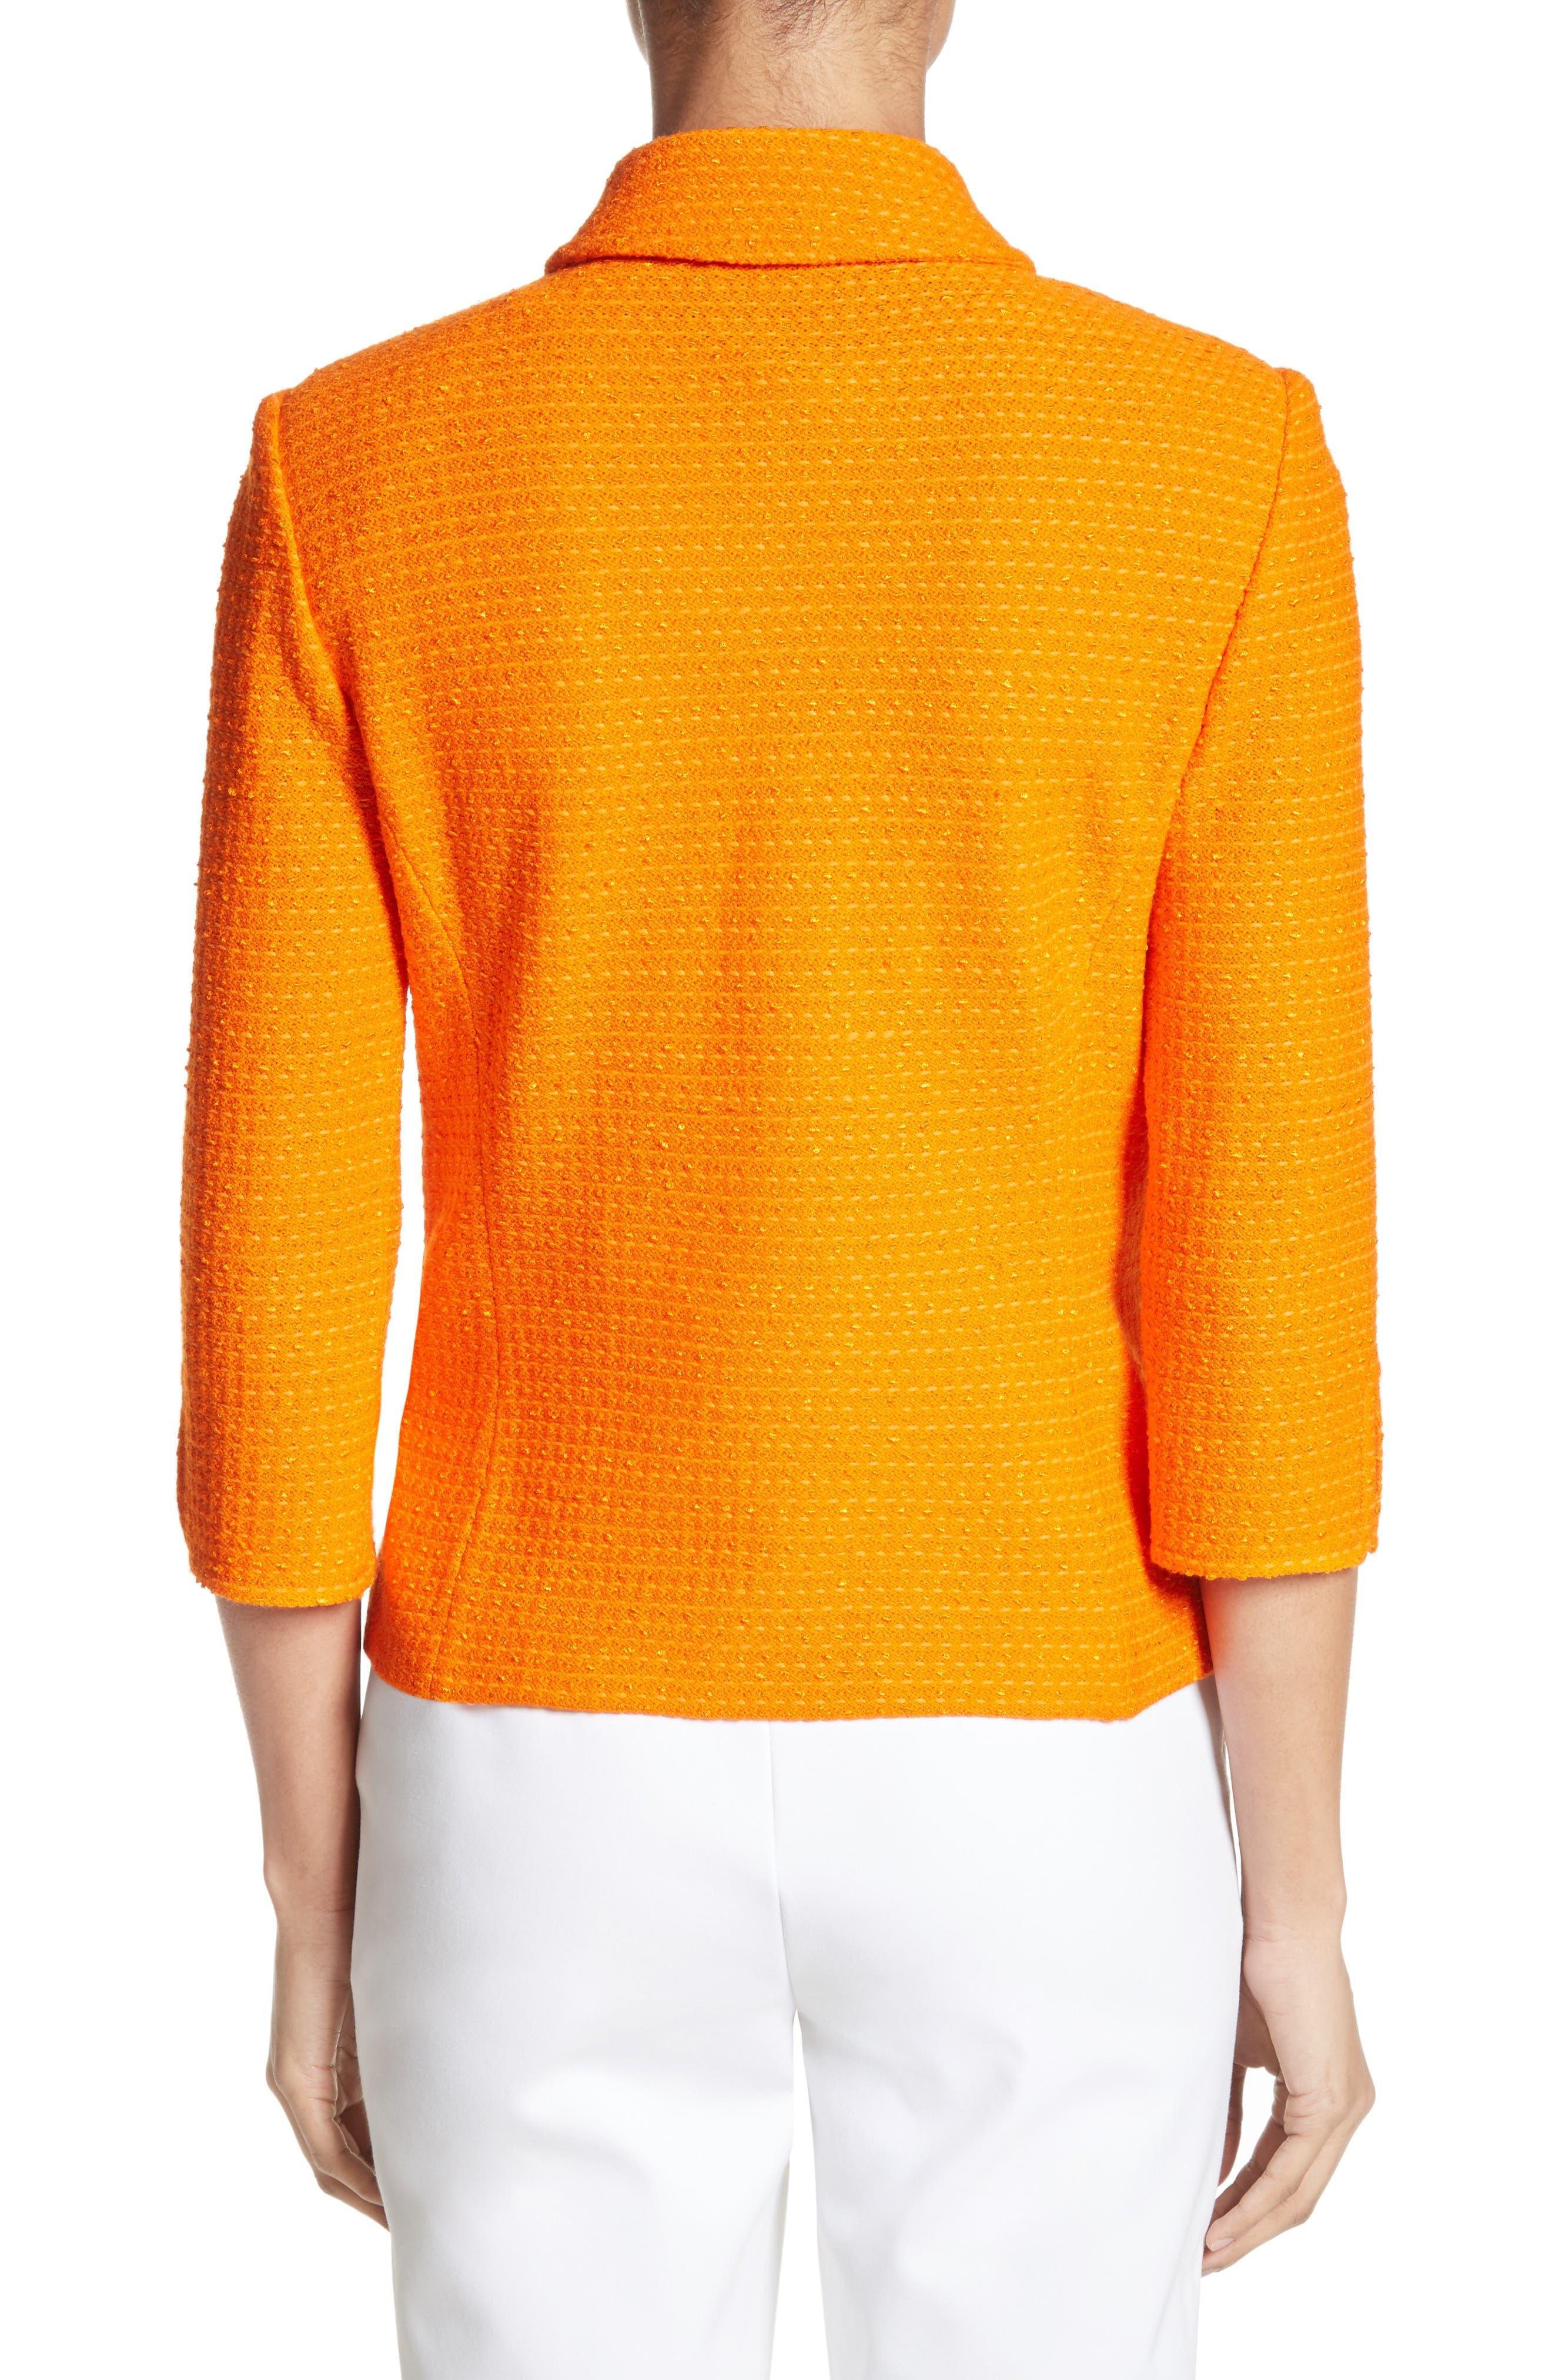 Ribbon Texture Knit Jacket,                             Alternate thumbnail 2, color,                             820